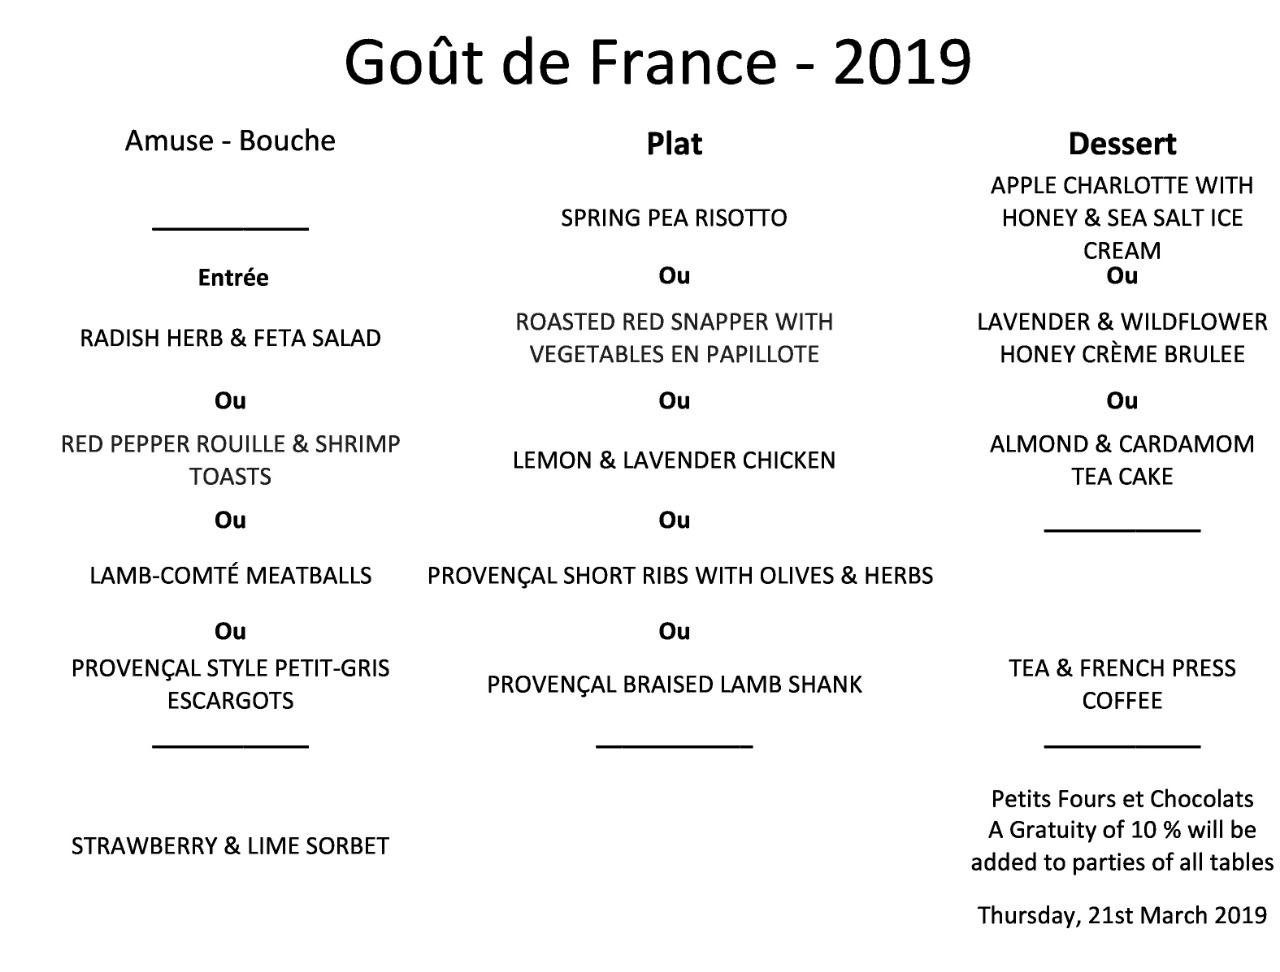 Good France - Menu - 21 March 2019.jpeg